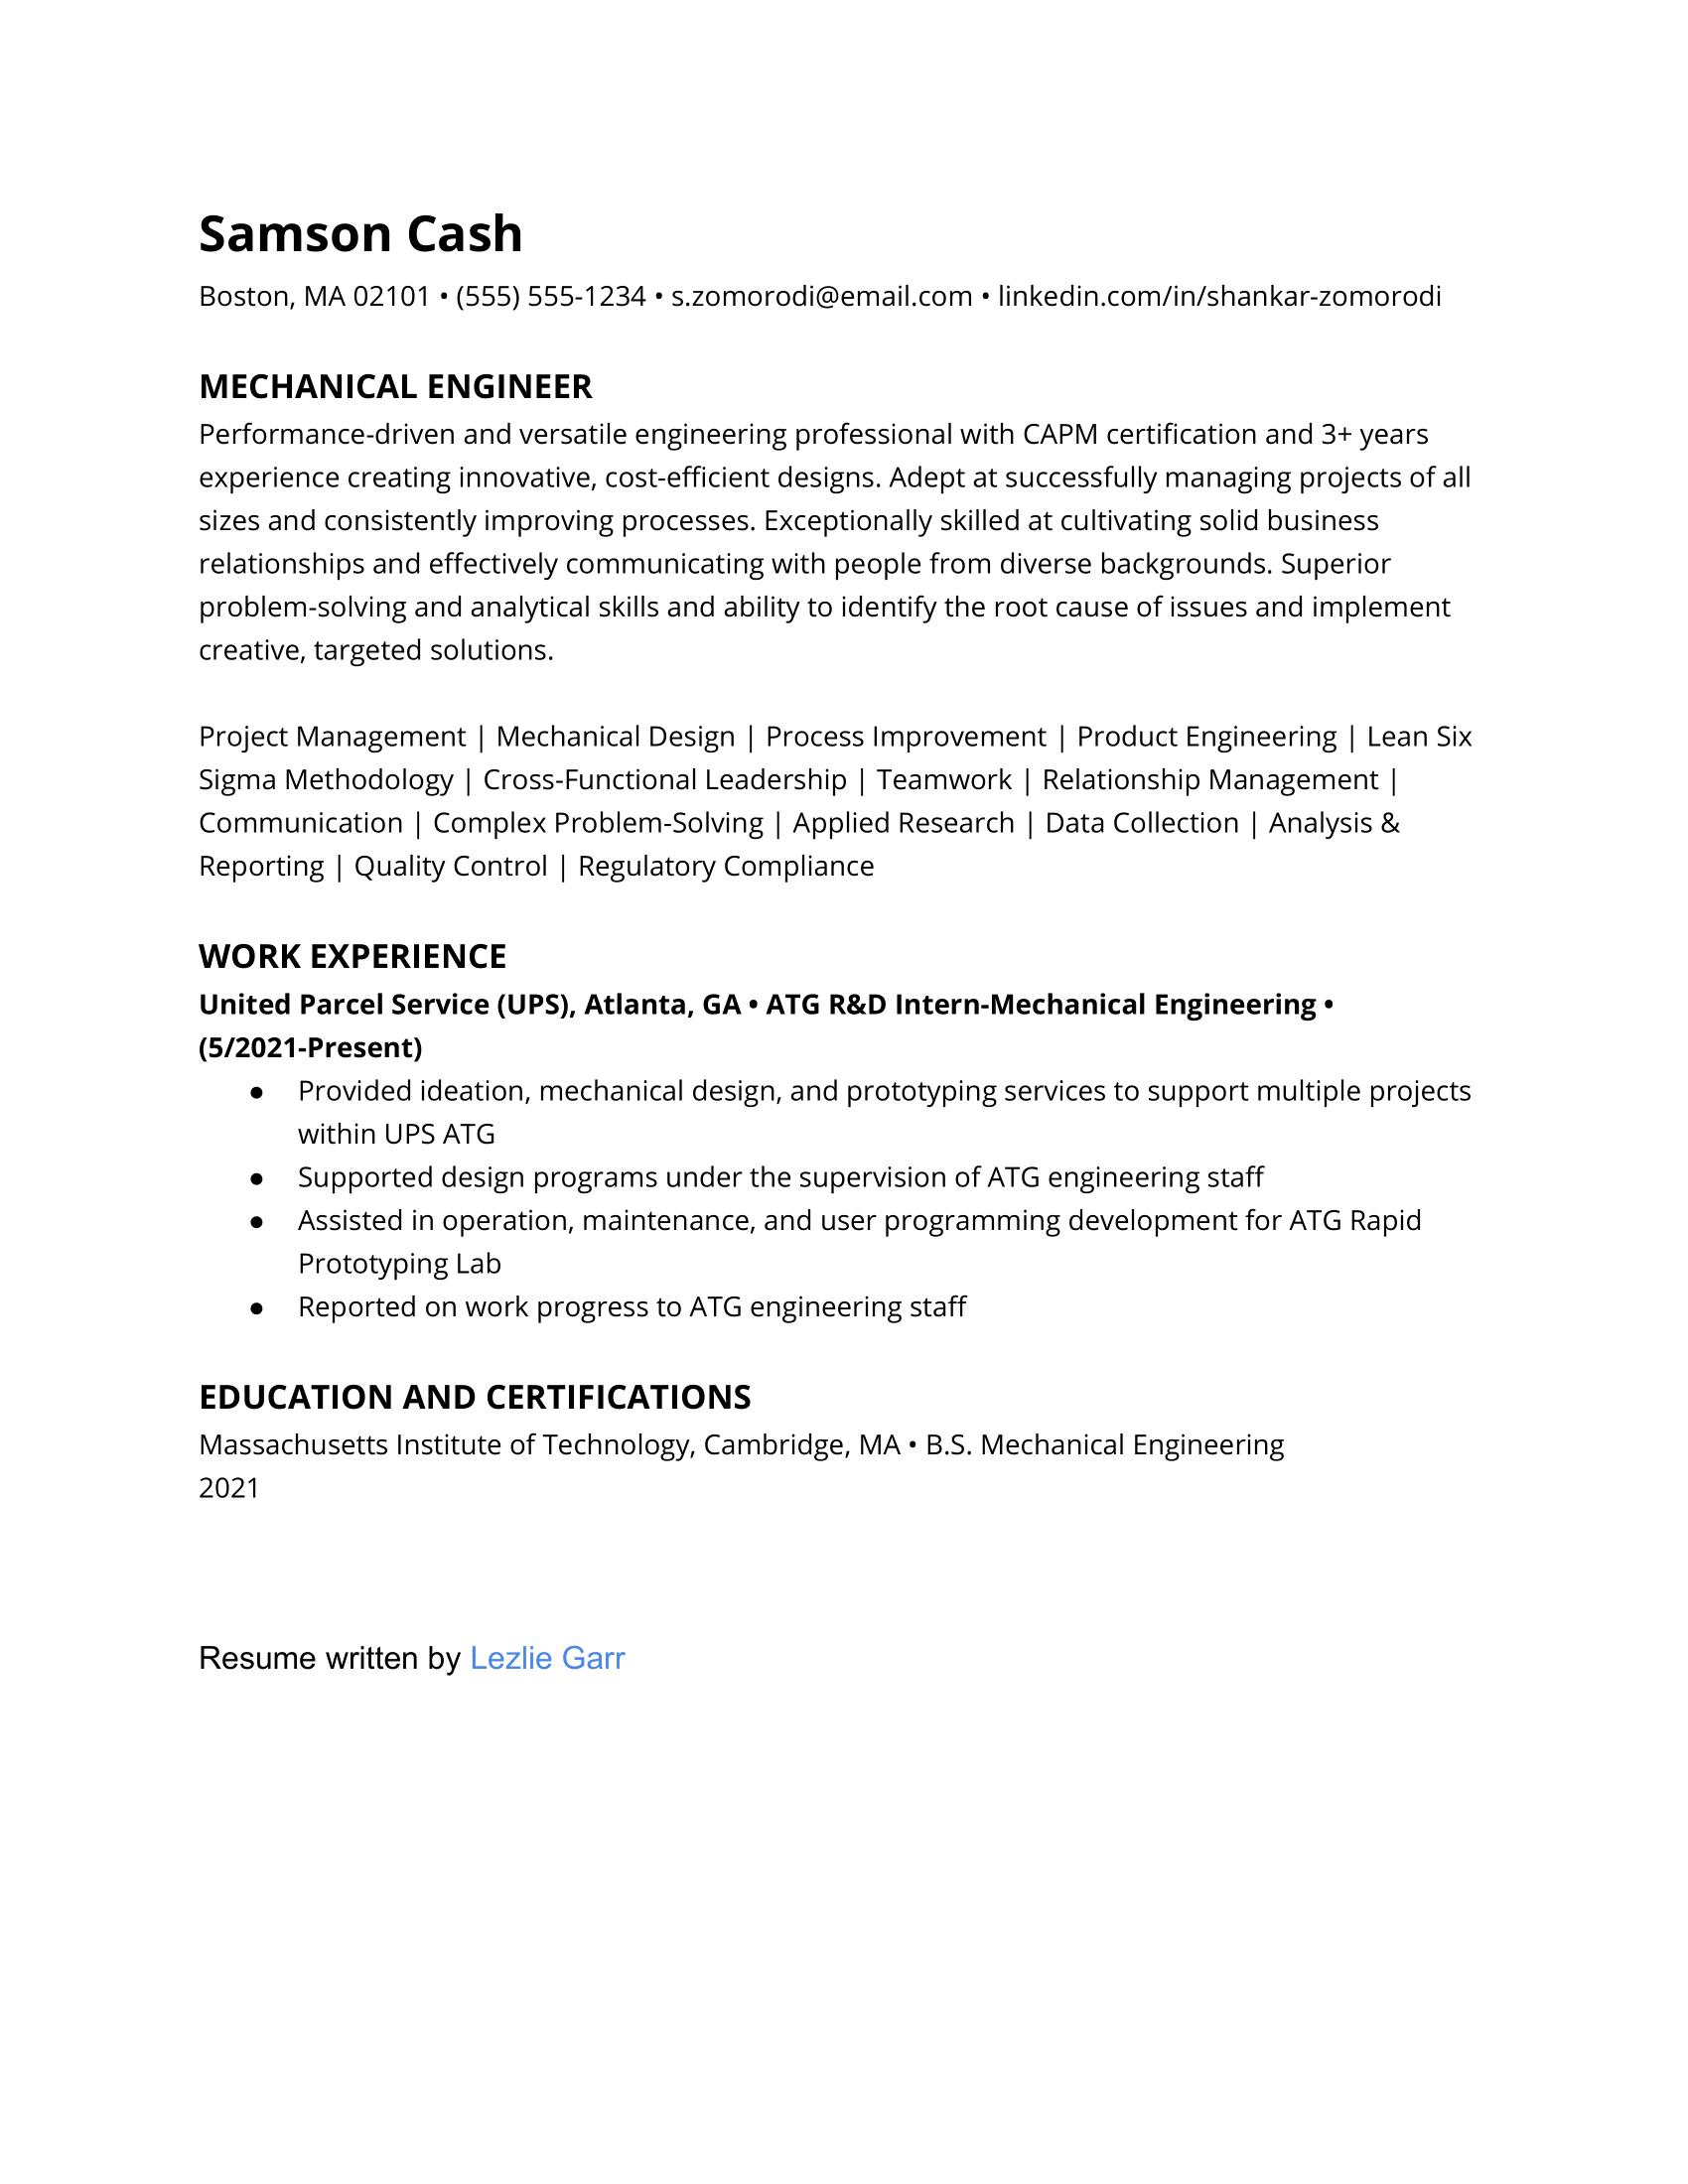 Entry-level mechanical engineering resume example